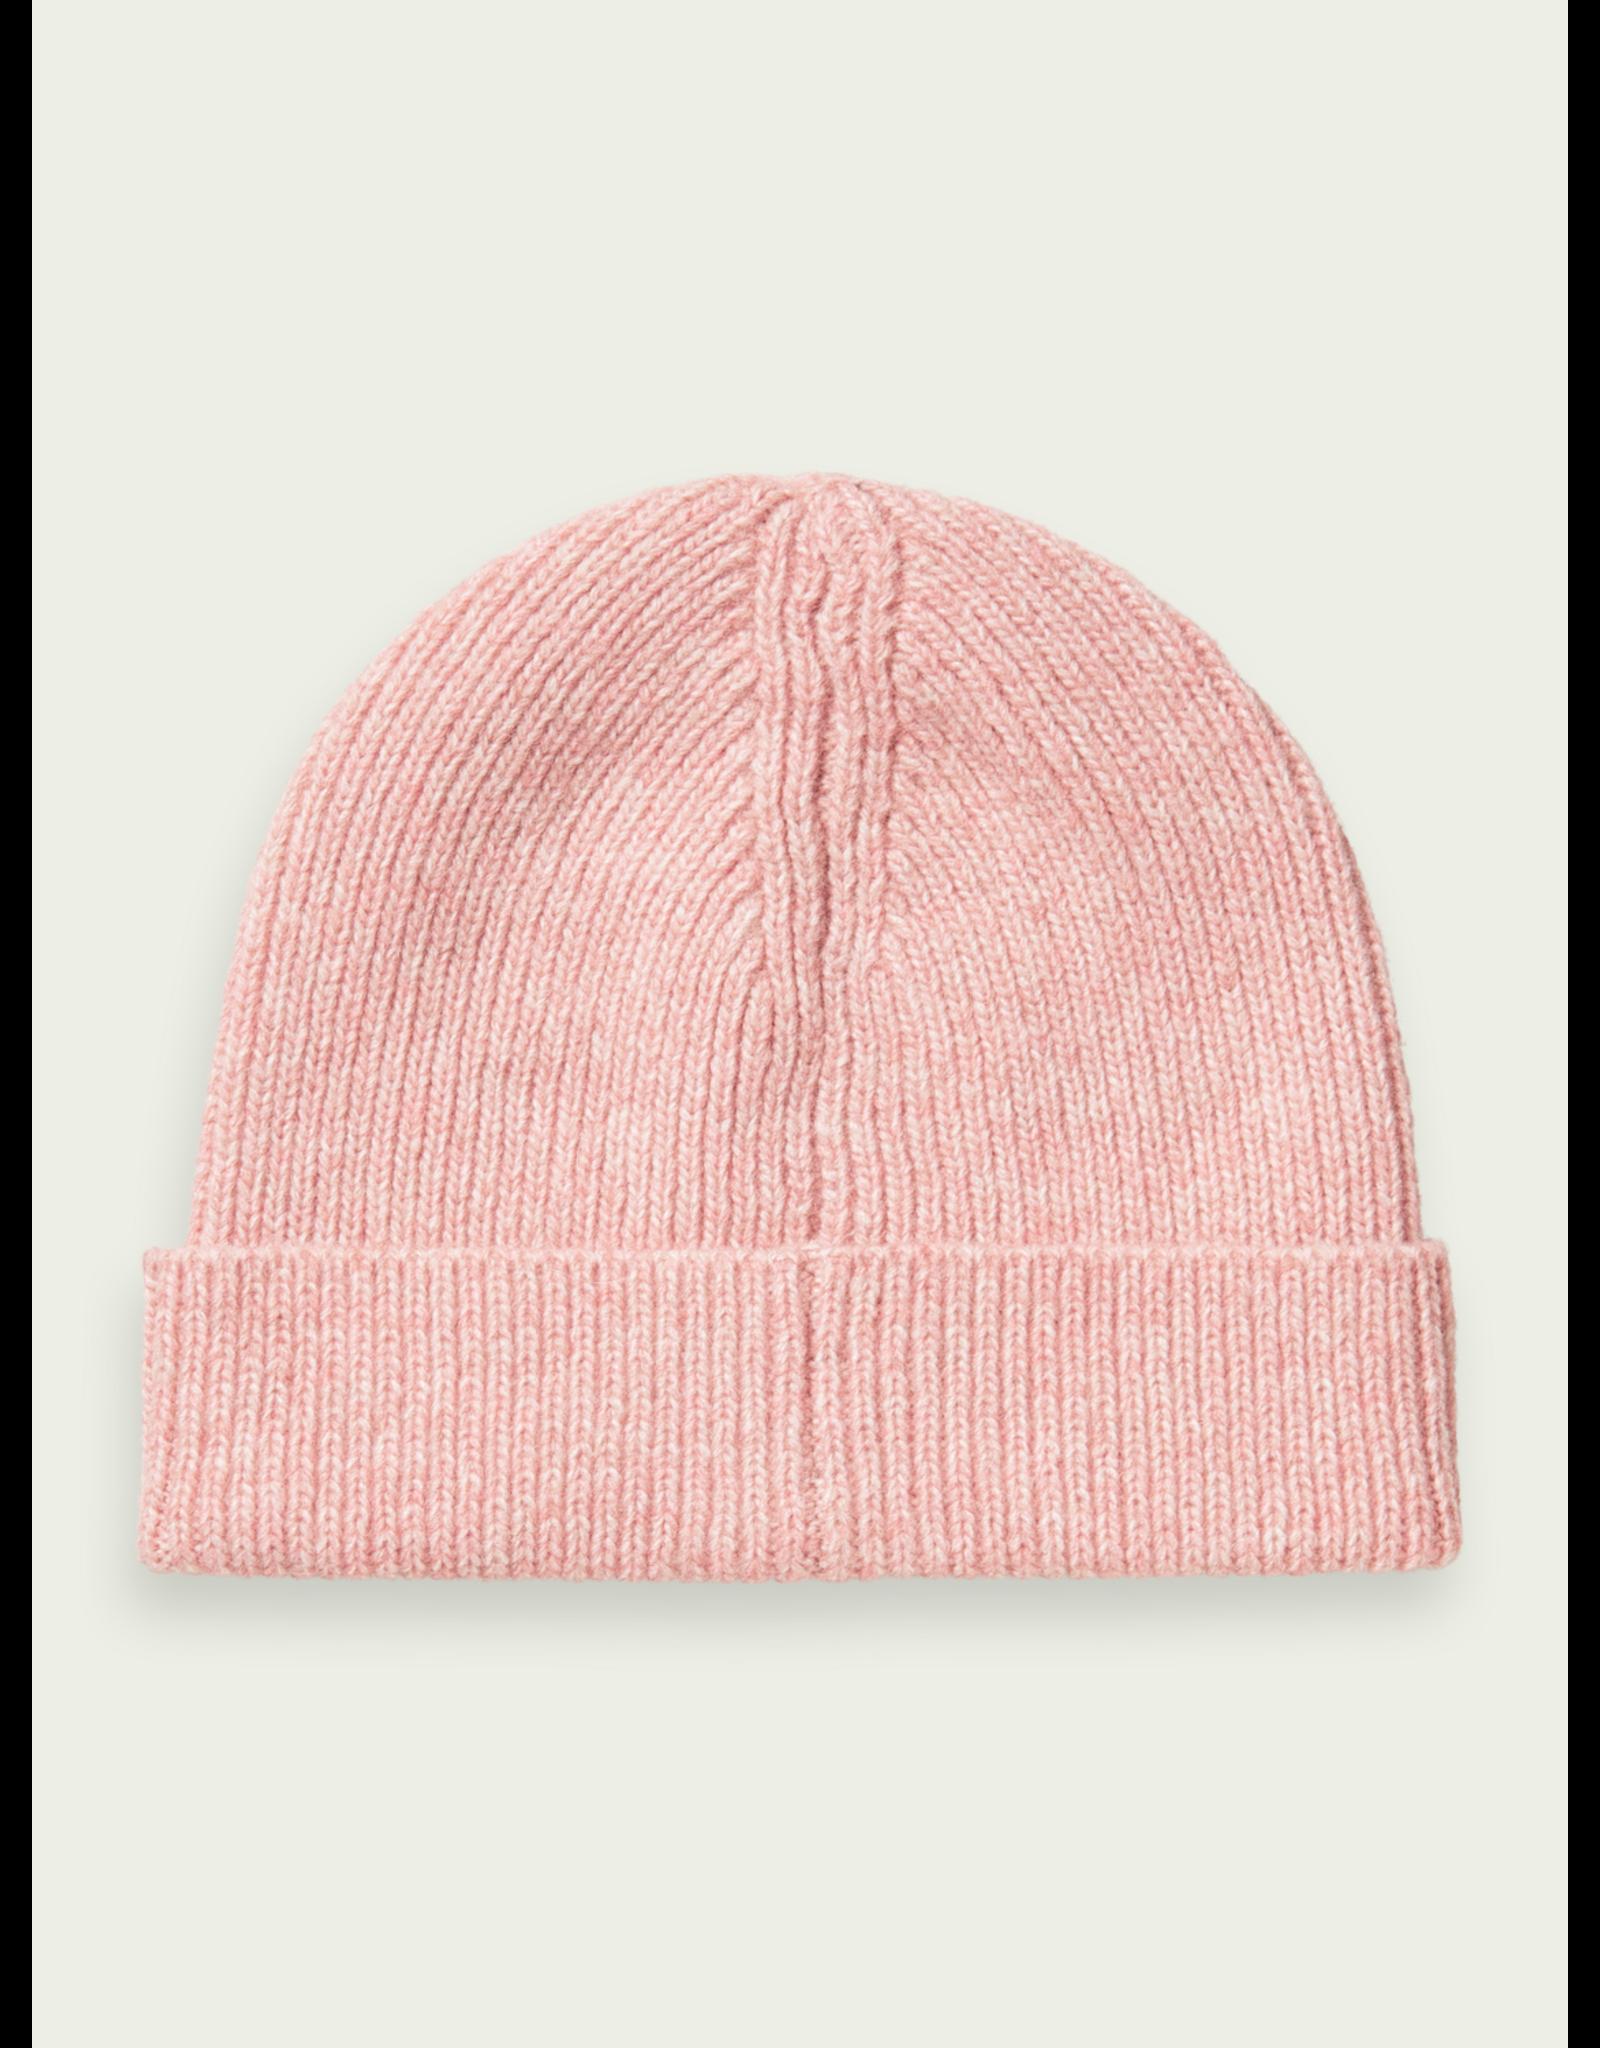 Scotch & Soda Beanie rib-knit wool blend pink